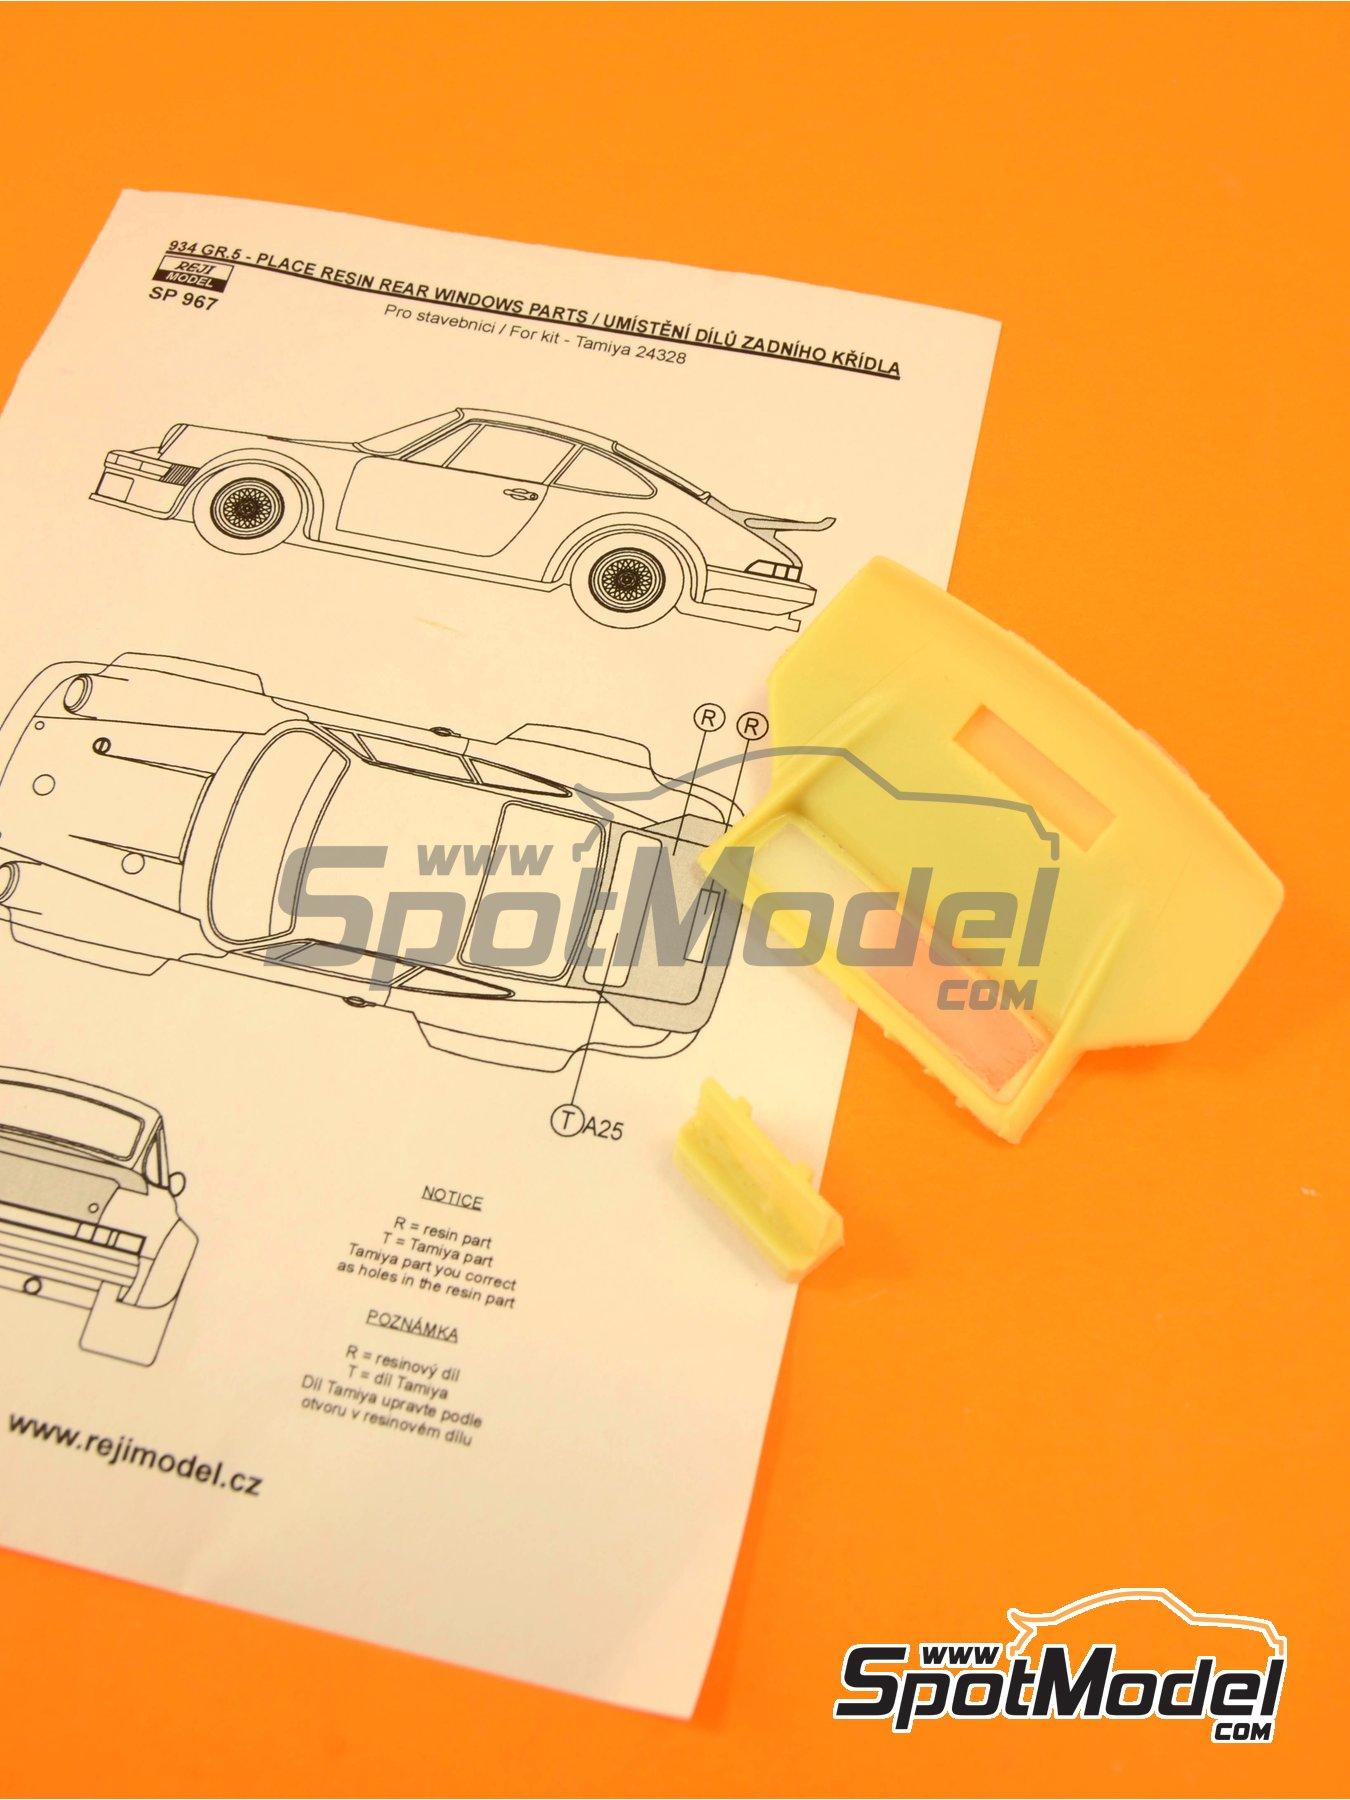 Porsche 934 Turbo RSR Group 4 - aleron trasero | Transkit en escala1/24 fabricado por Reji Model (ref.REJI-SP967) image